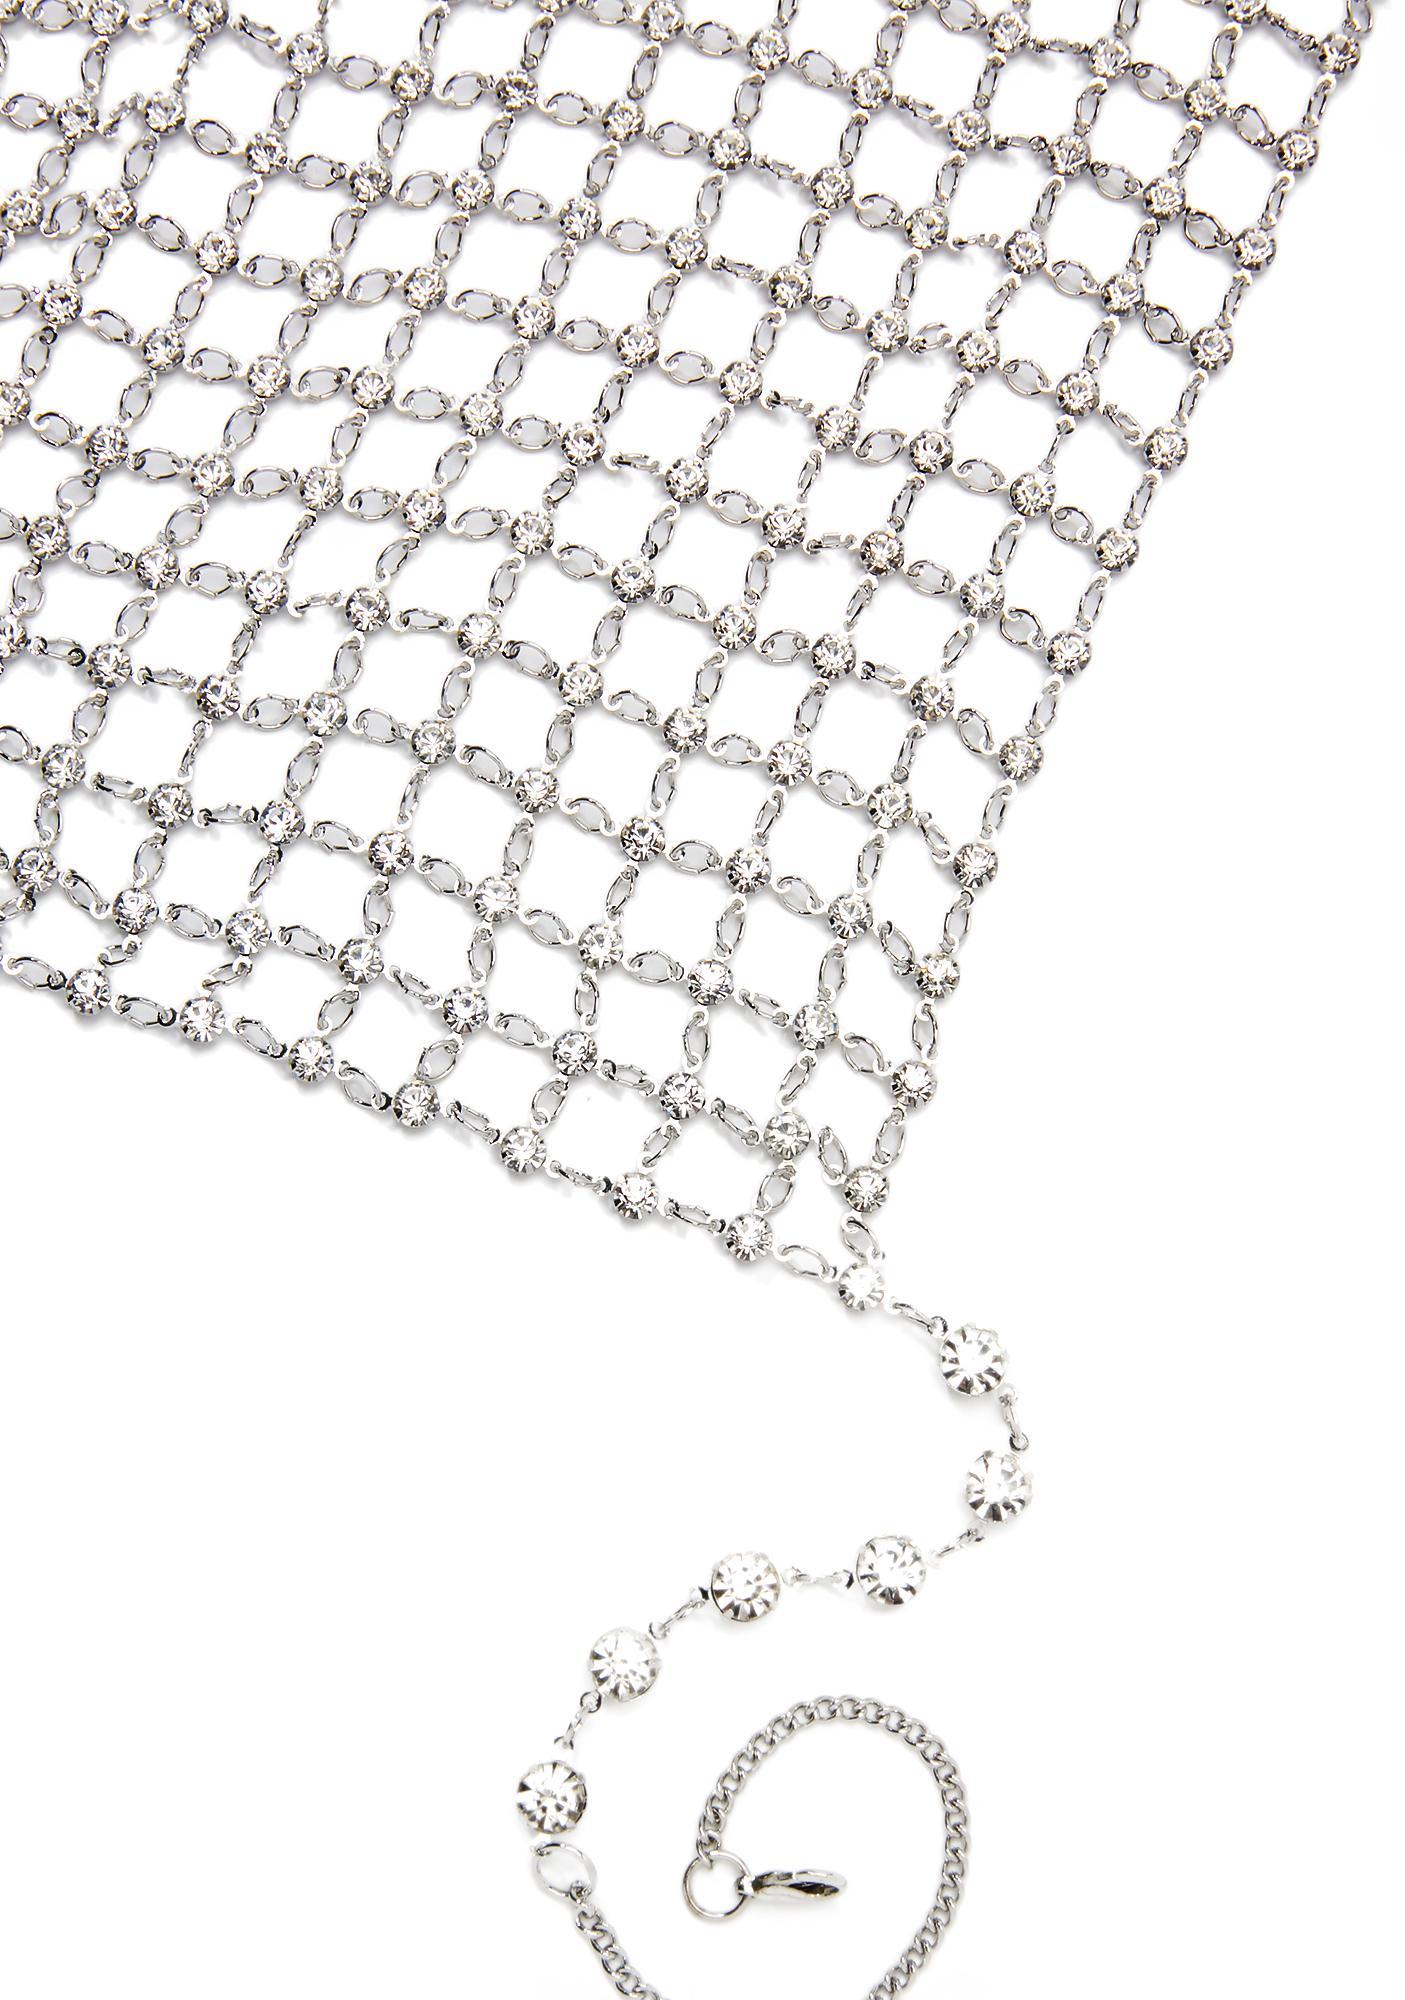 Shimmy Rhinestone Chain Top